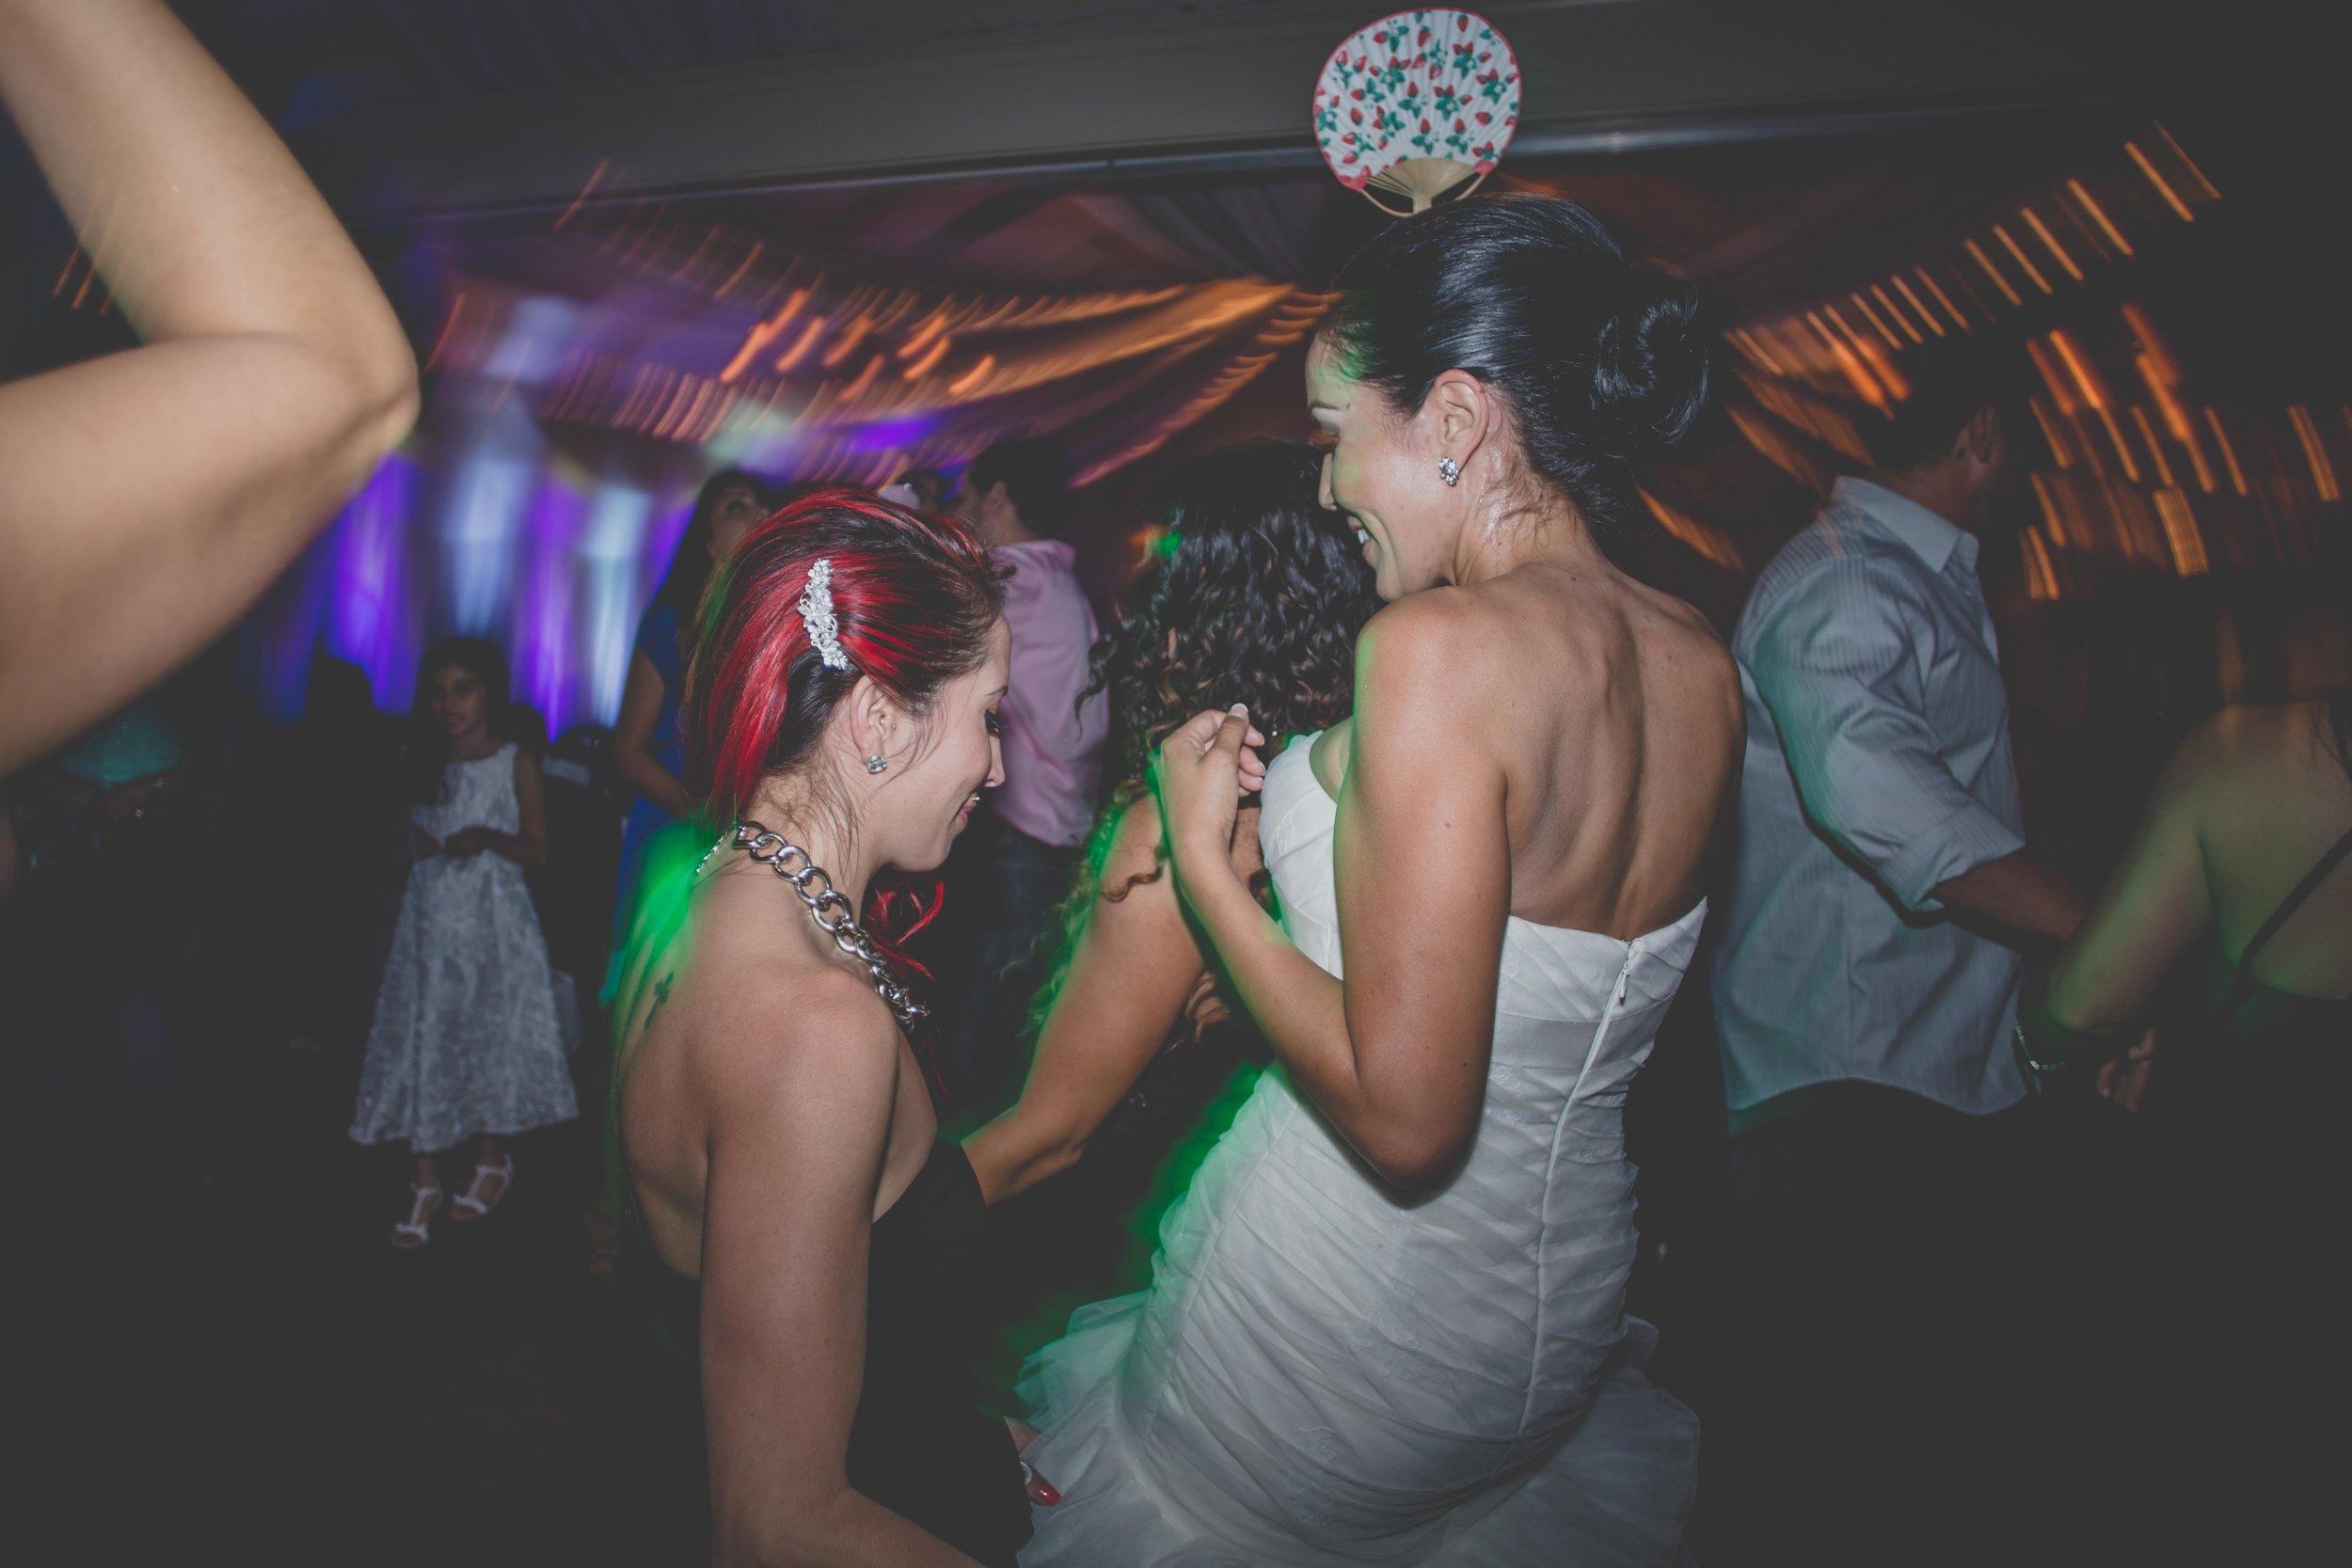 APavone-Photographer-Orange-County-Diamond-Bar-Wedding-082.jpg